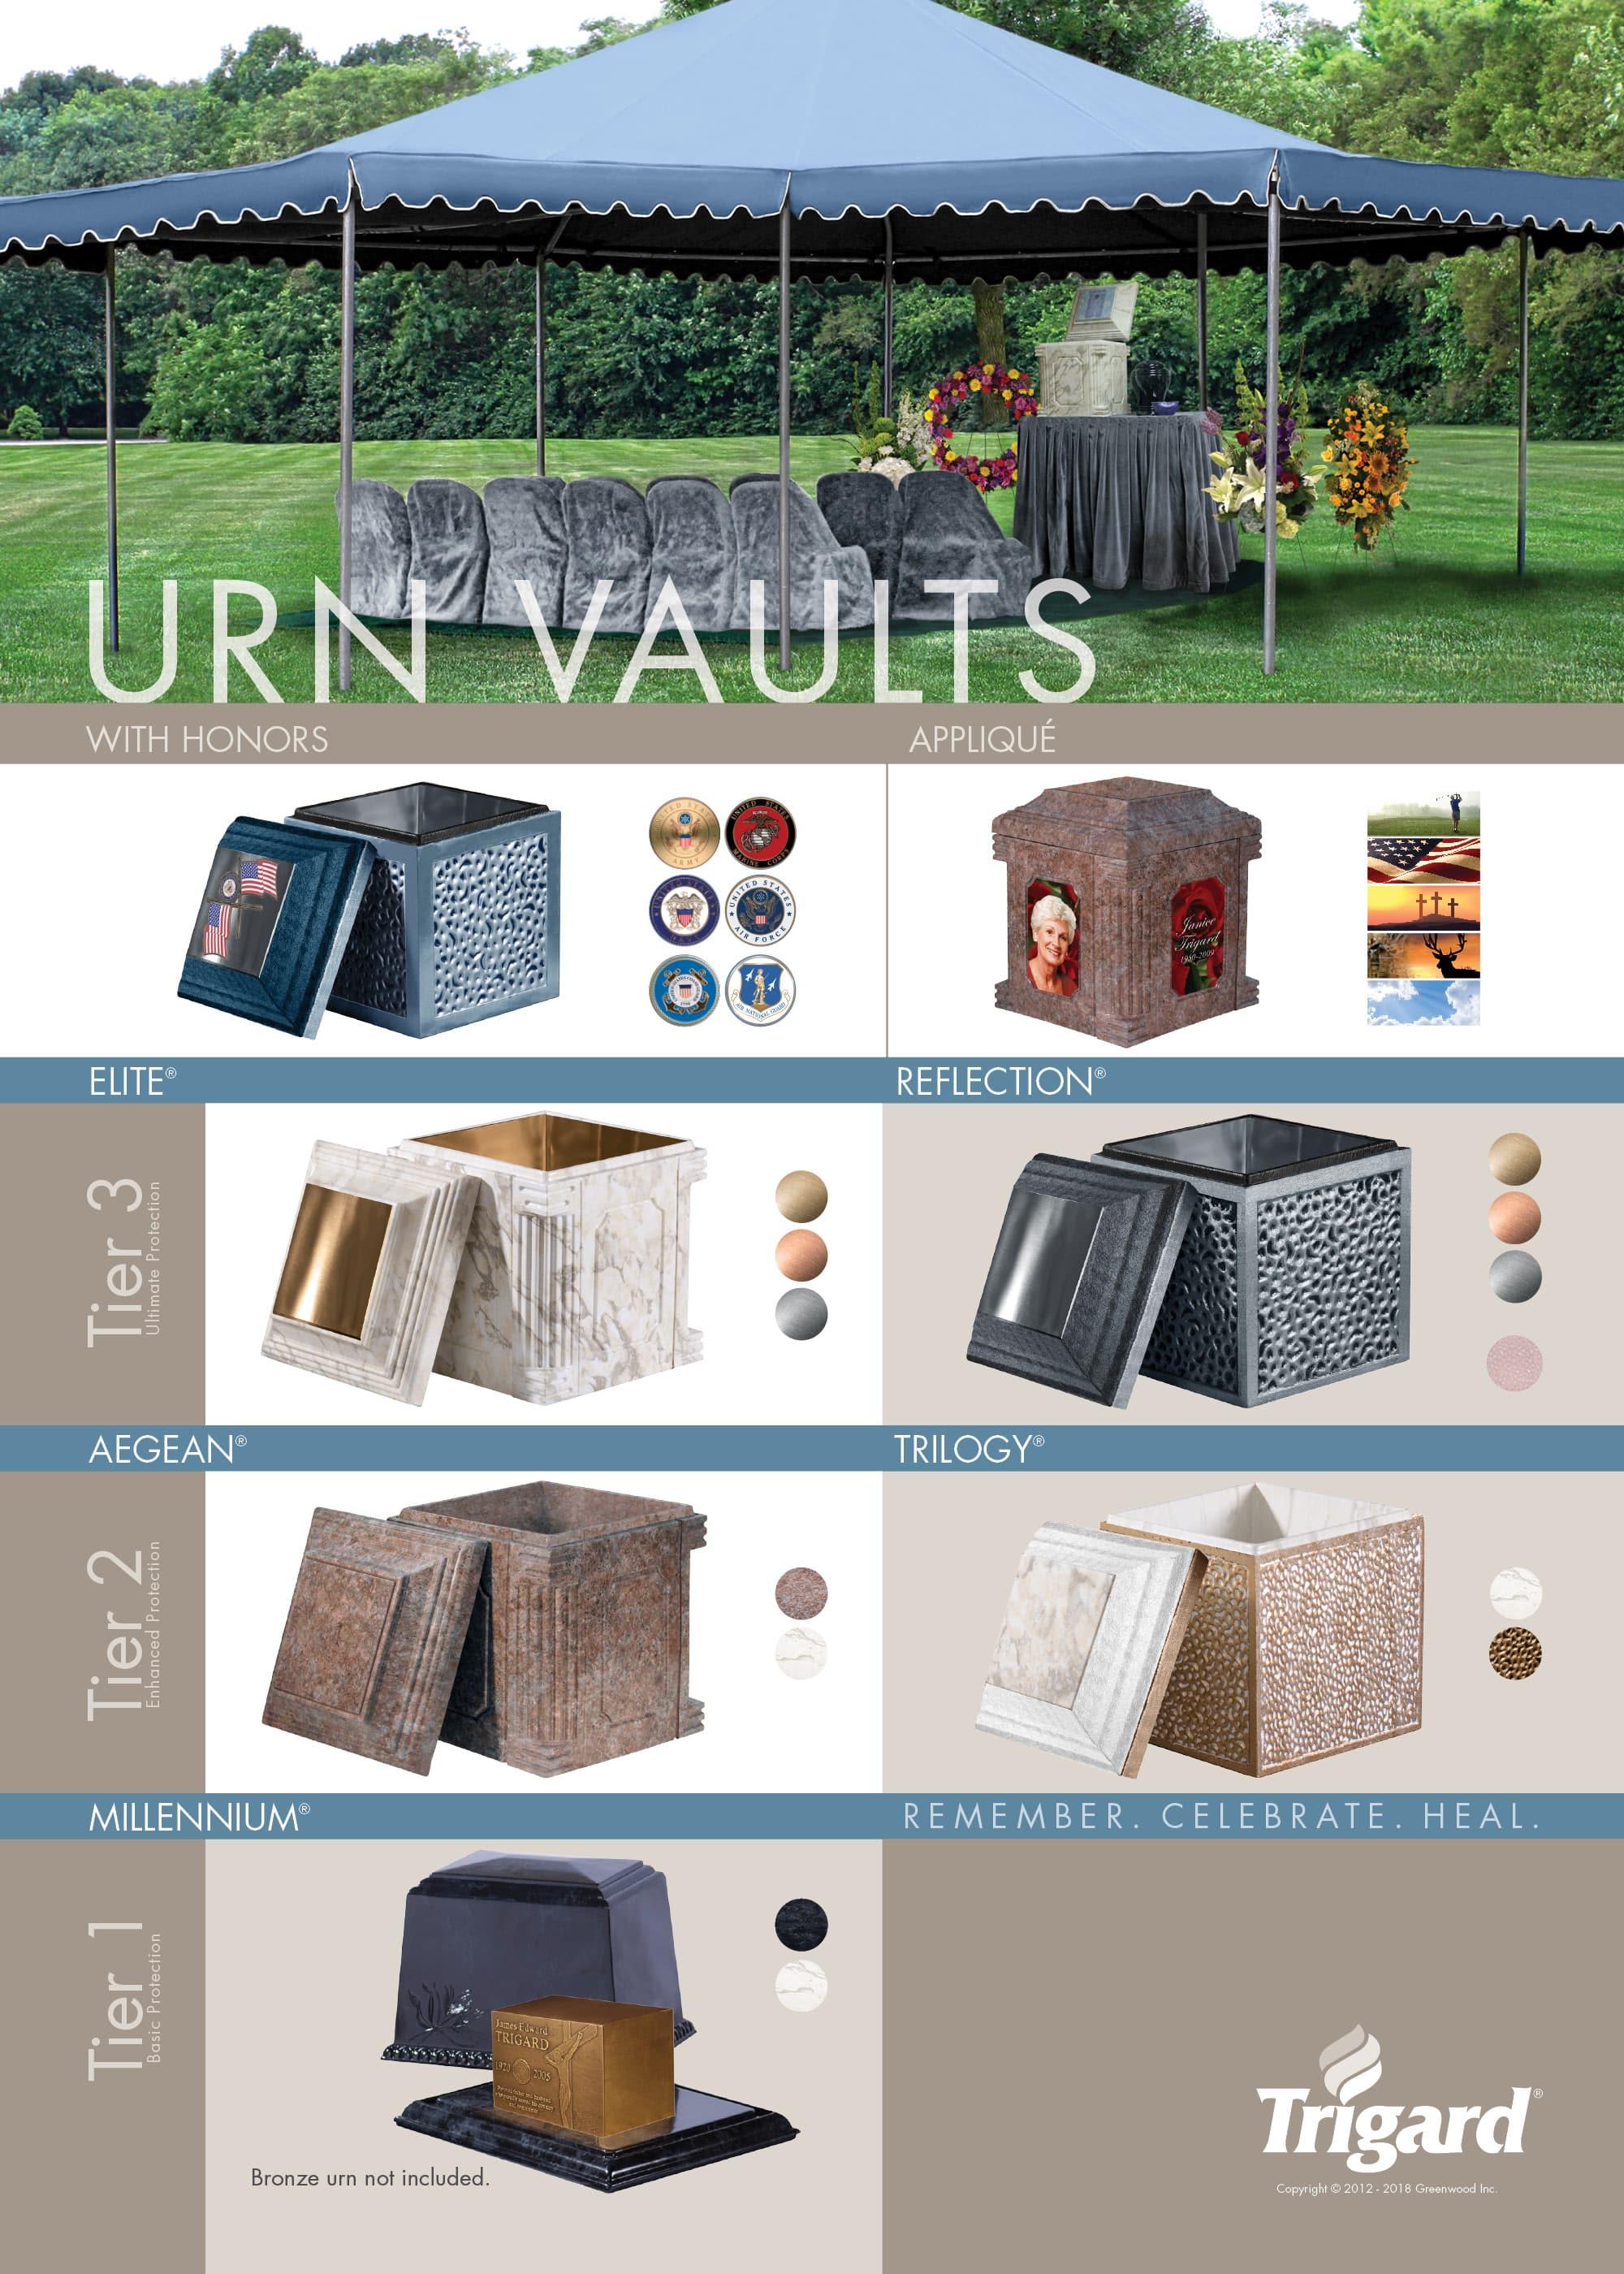 Urn Vault Display